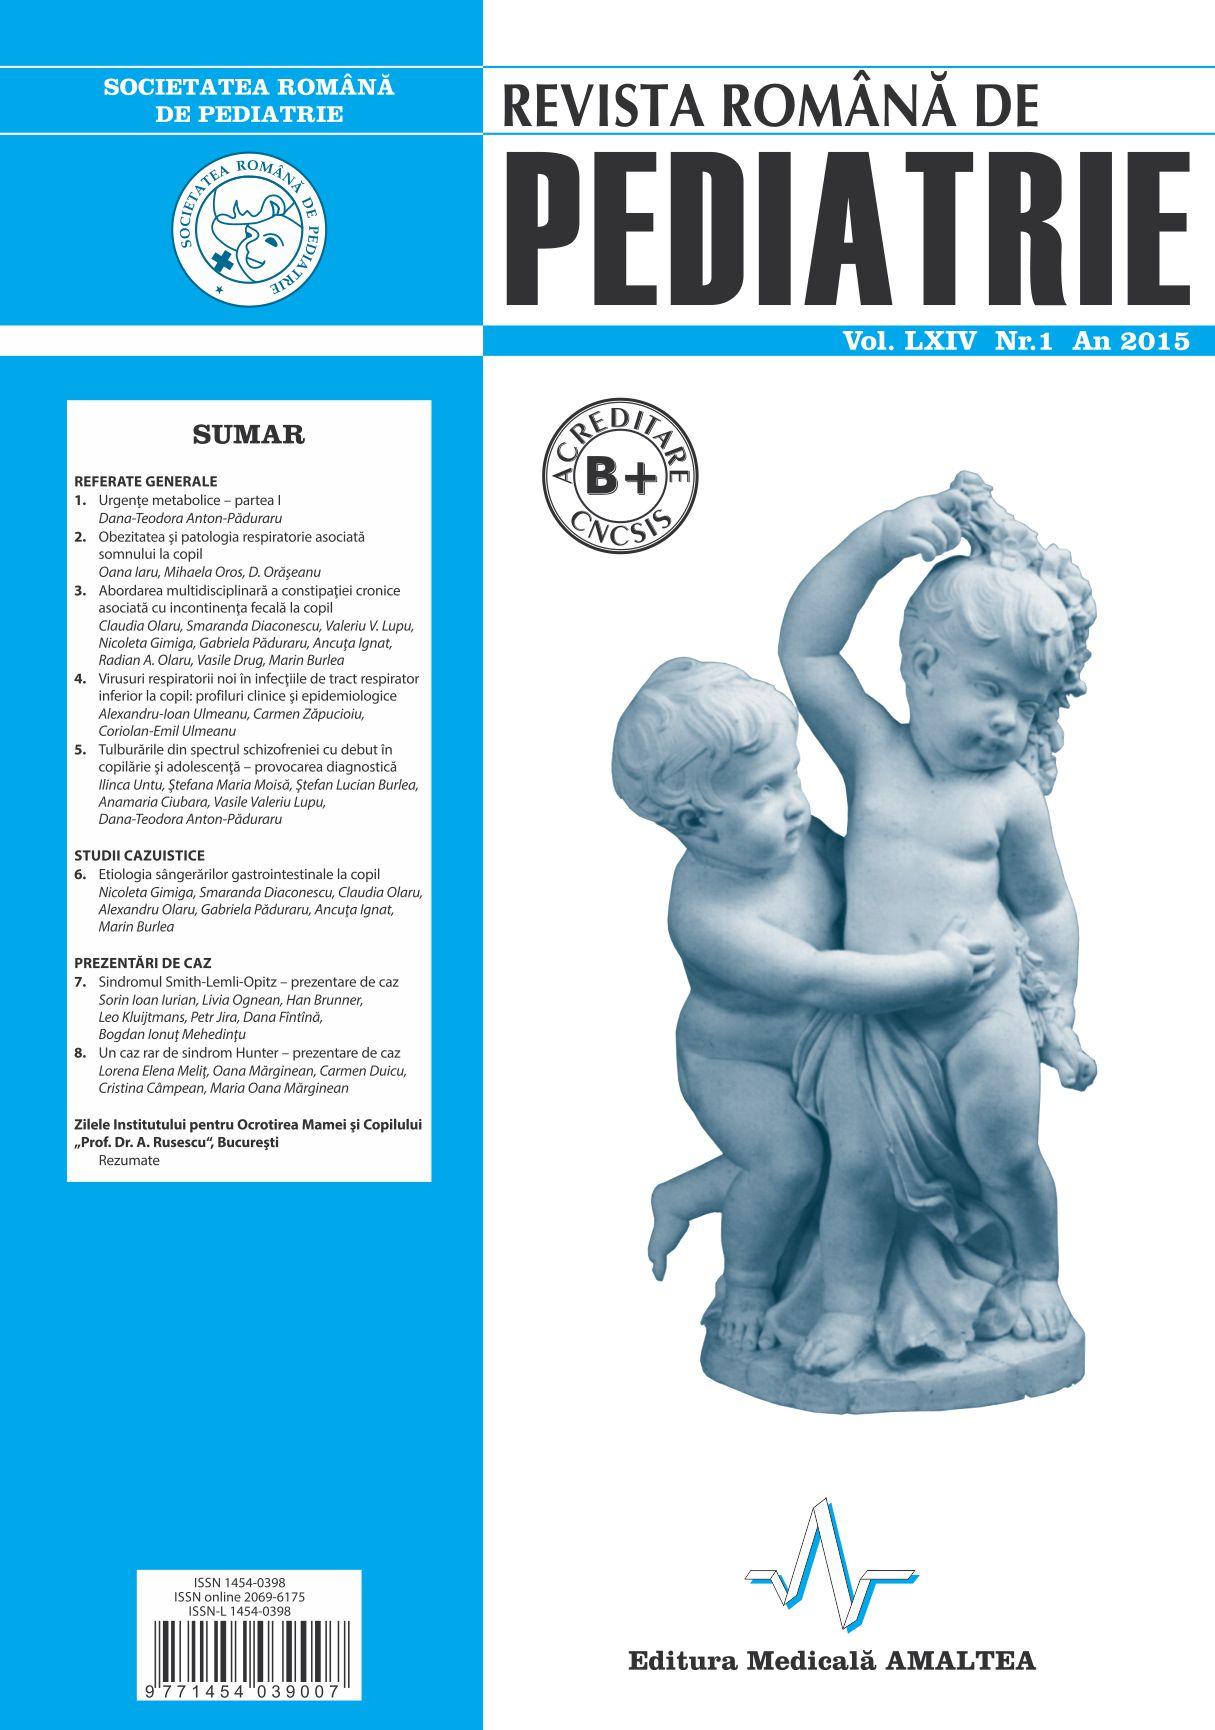 Revista Romana de PEDIATRIE | Volumul LXIV, Nr. 1, An 2015